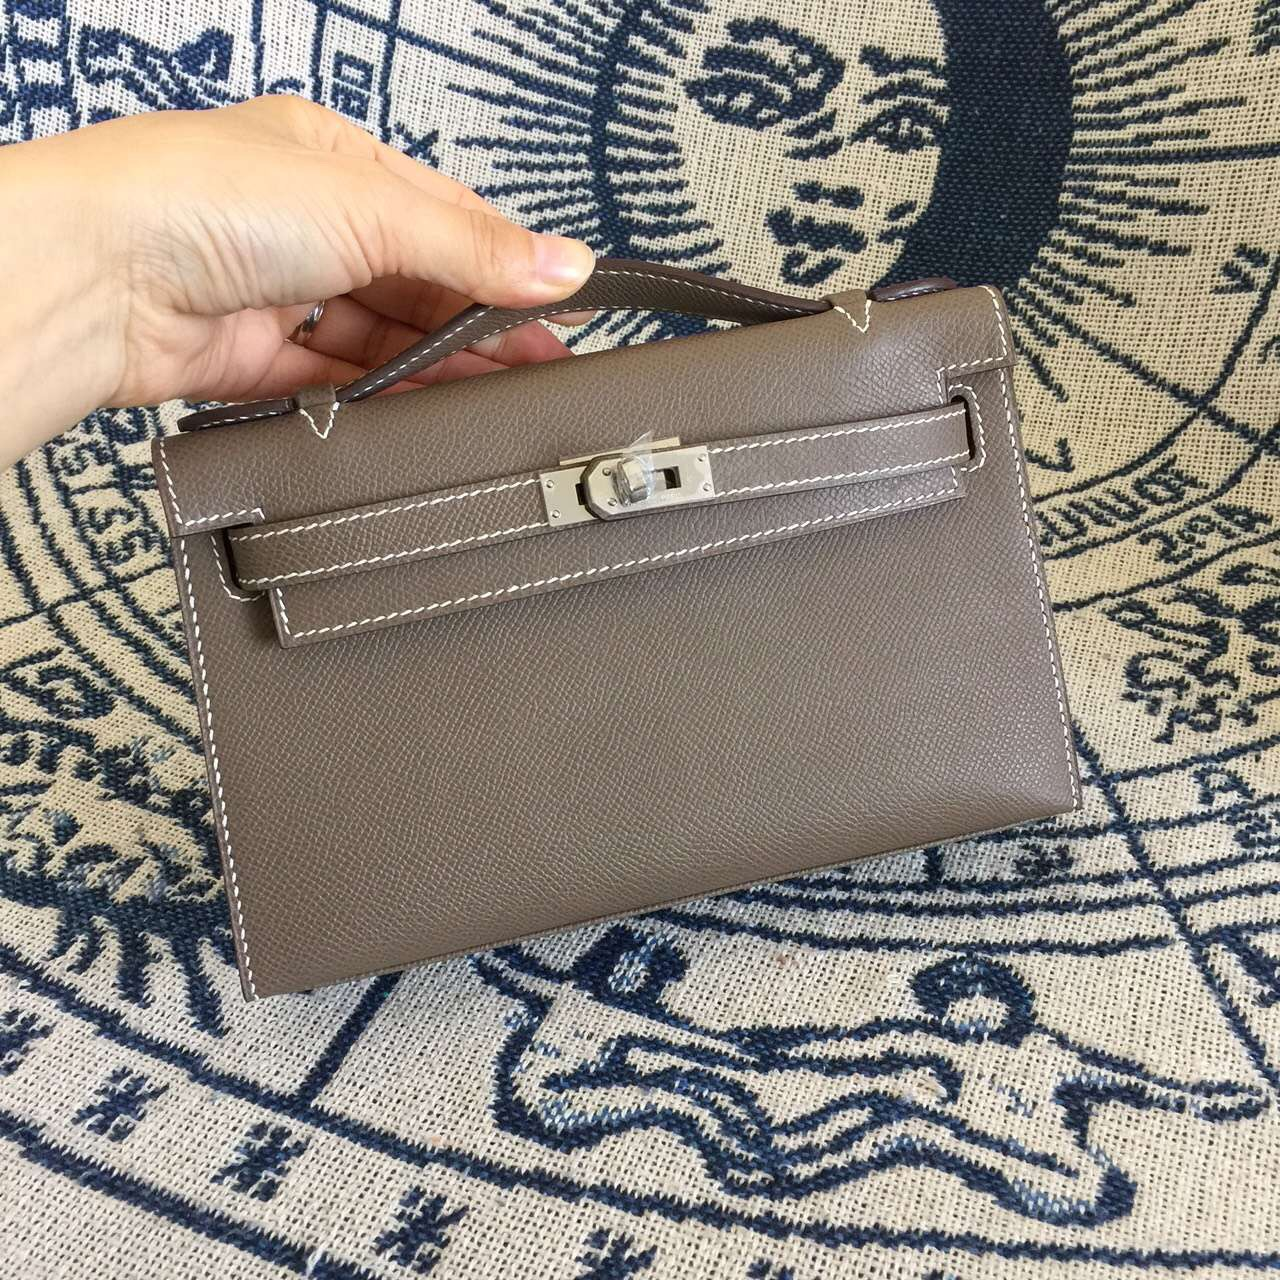 New Fashion Hermes CK18 Etoupe Grey Epsom Leather Mini Kelly Clutch Bag